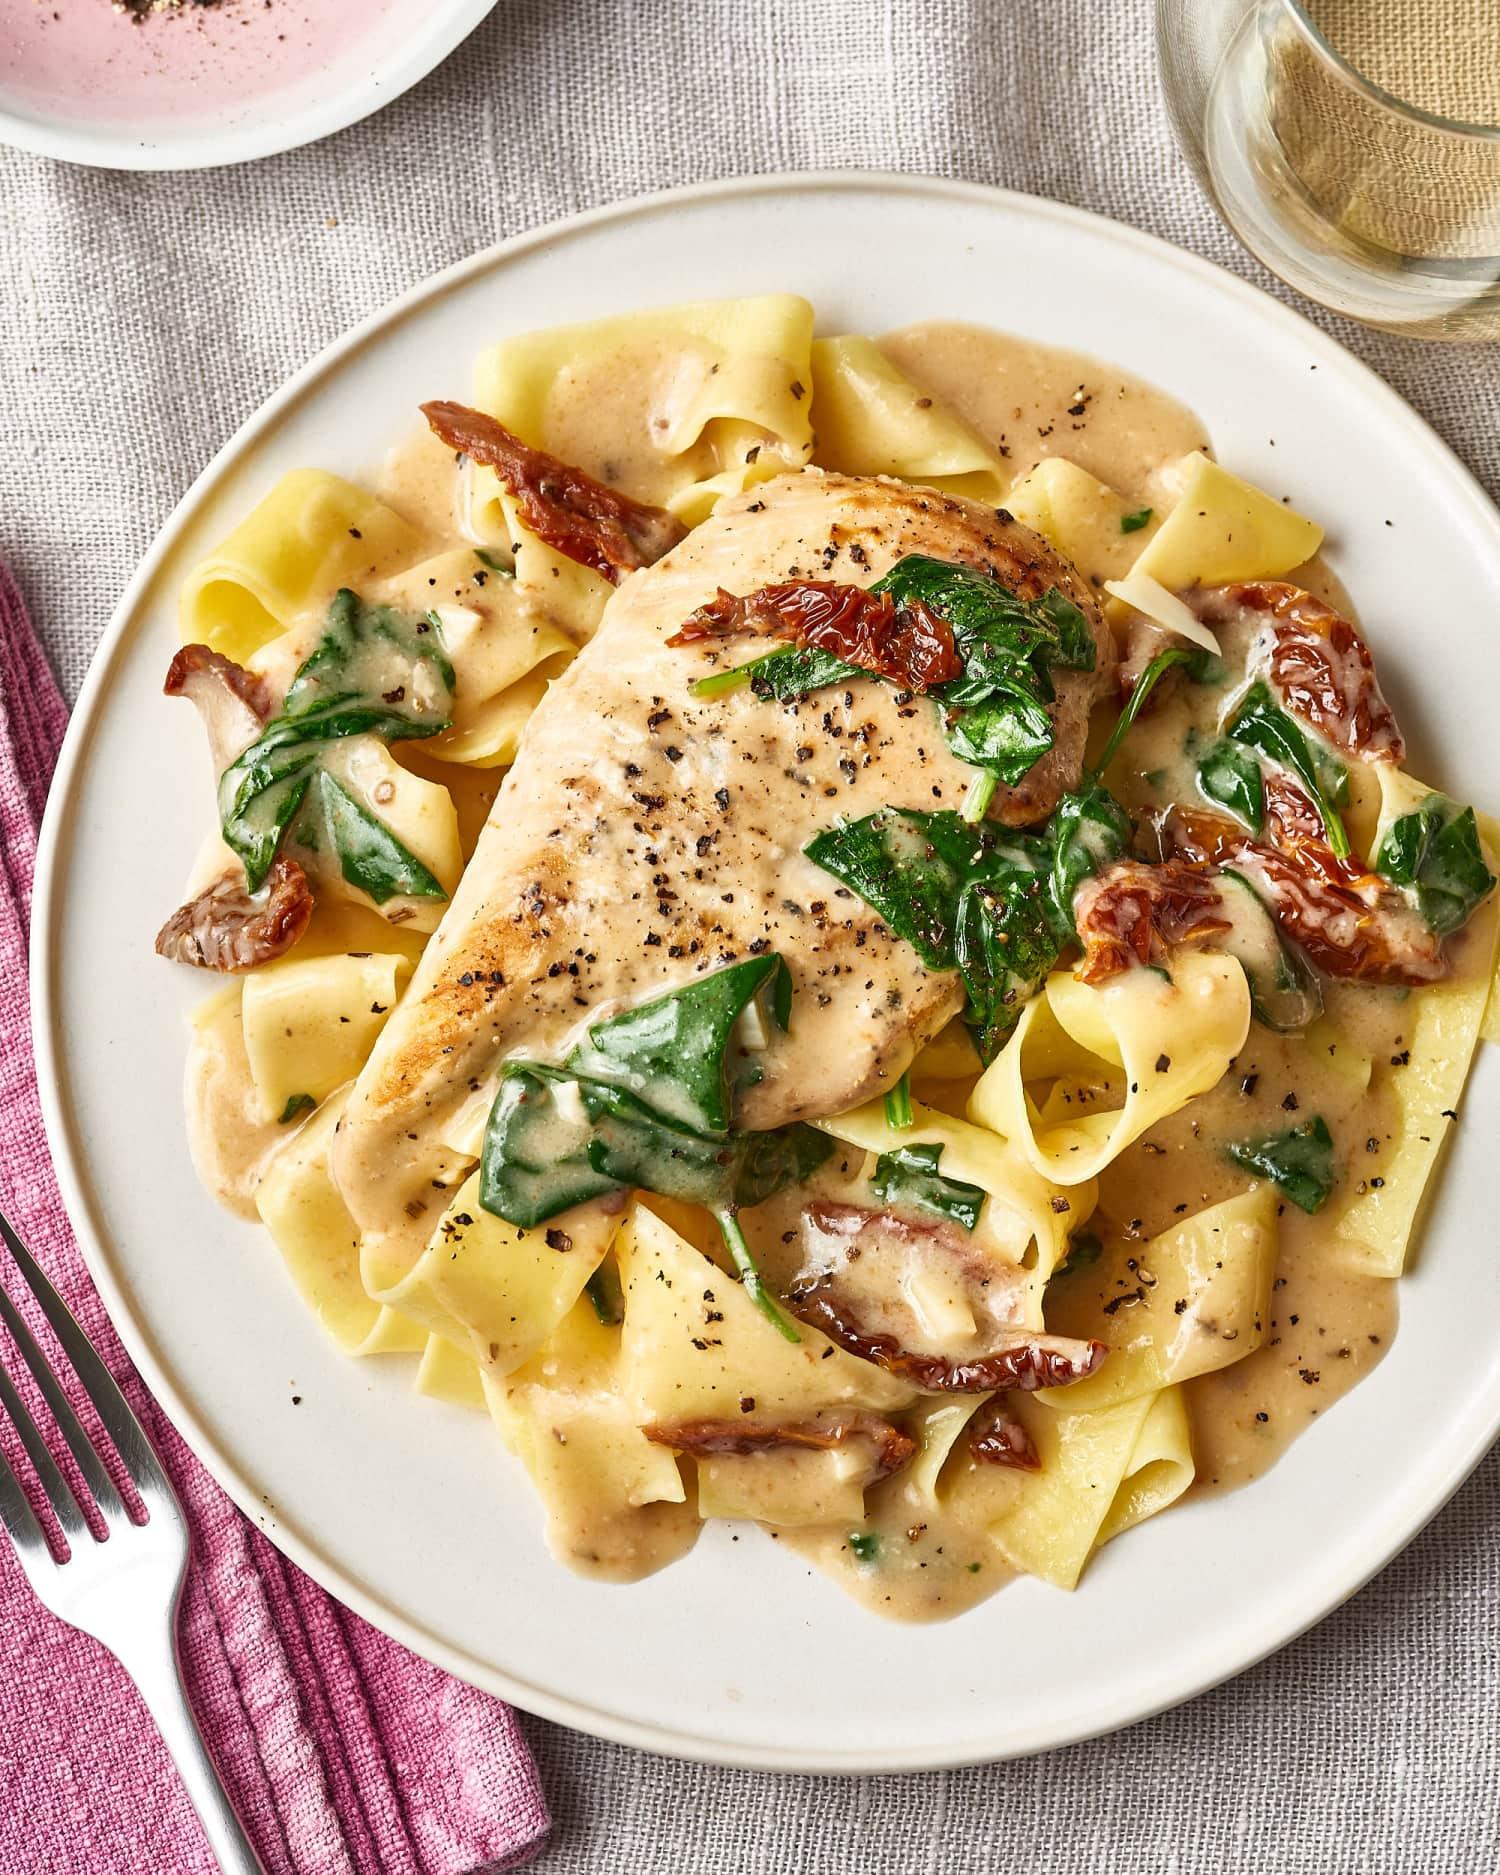 Recipe: Slow Cooker Creamy Tuscan Garlic Chicken